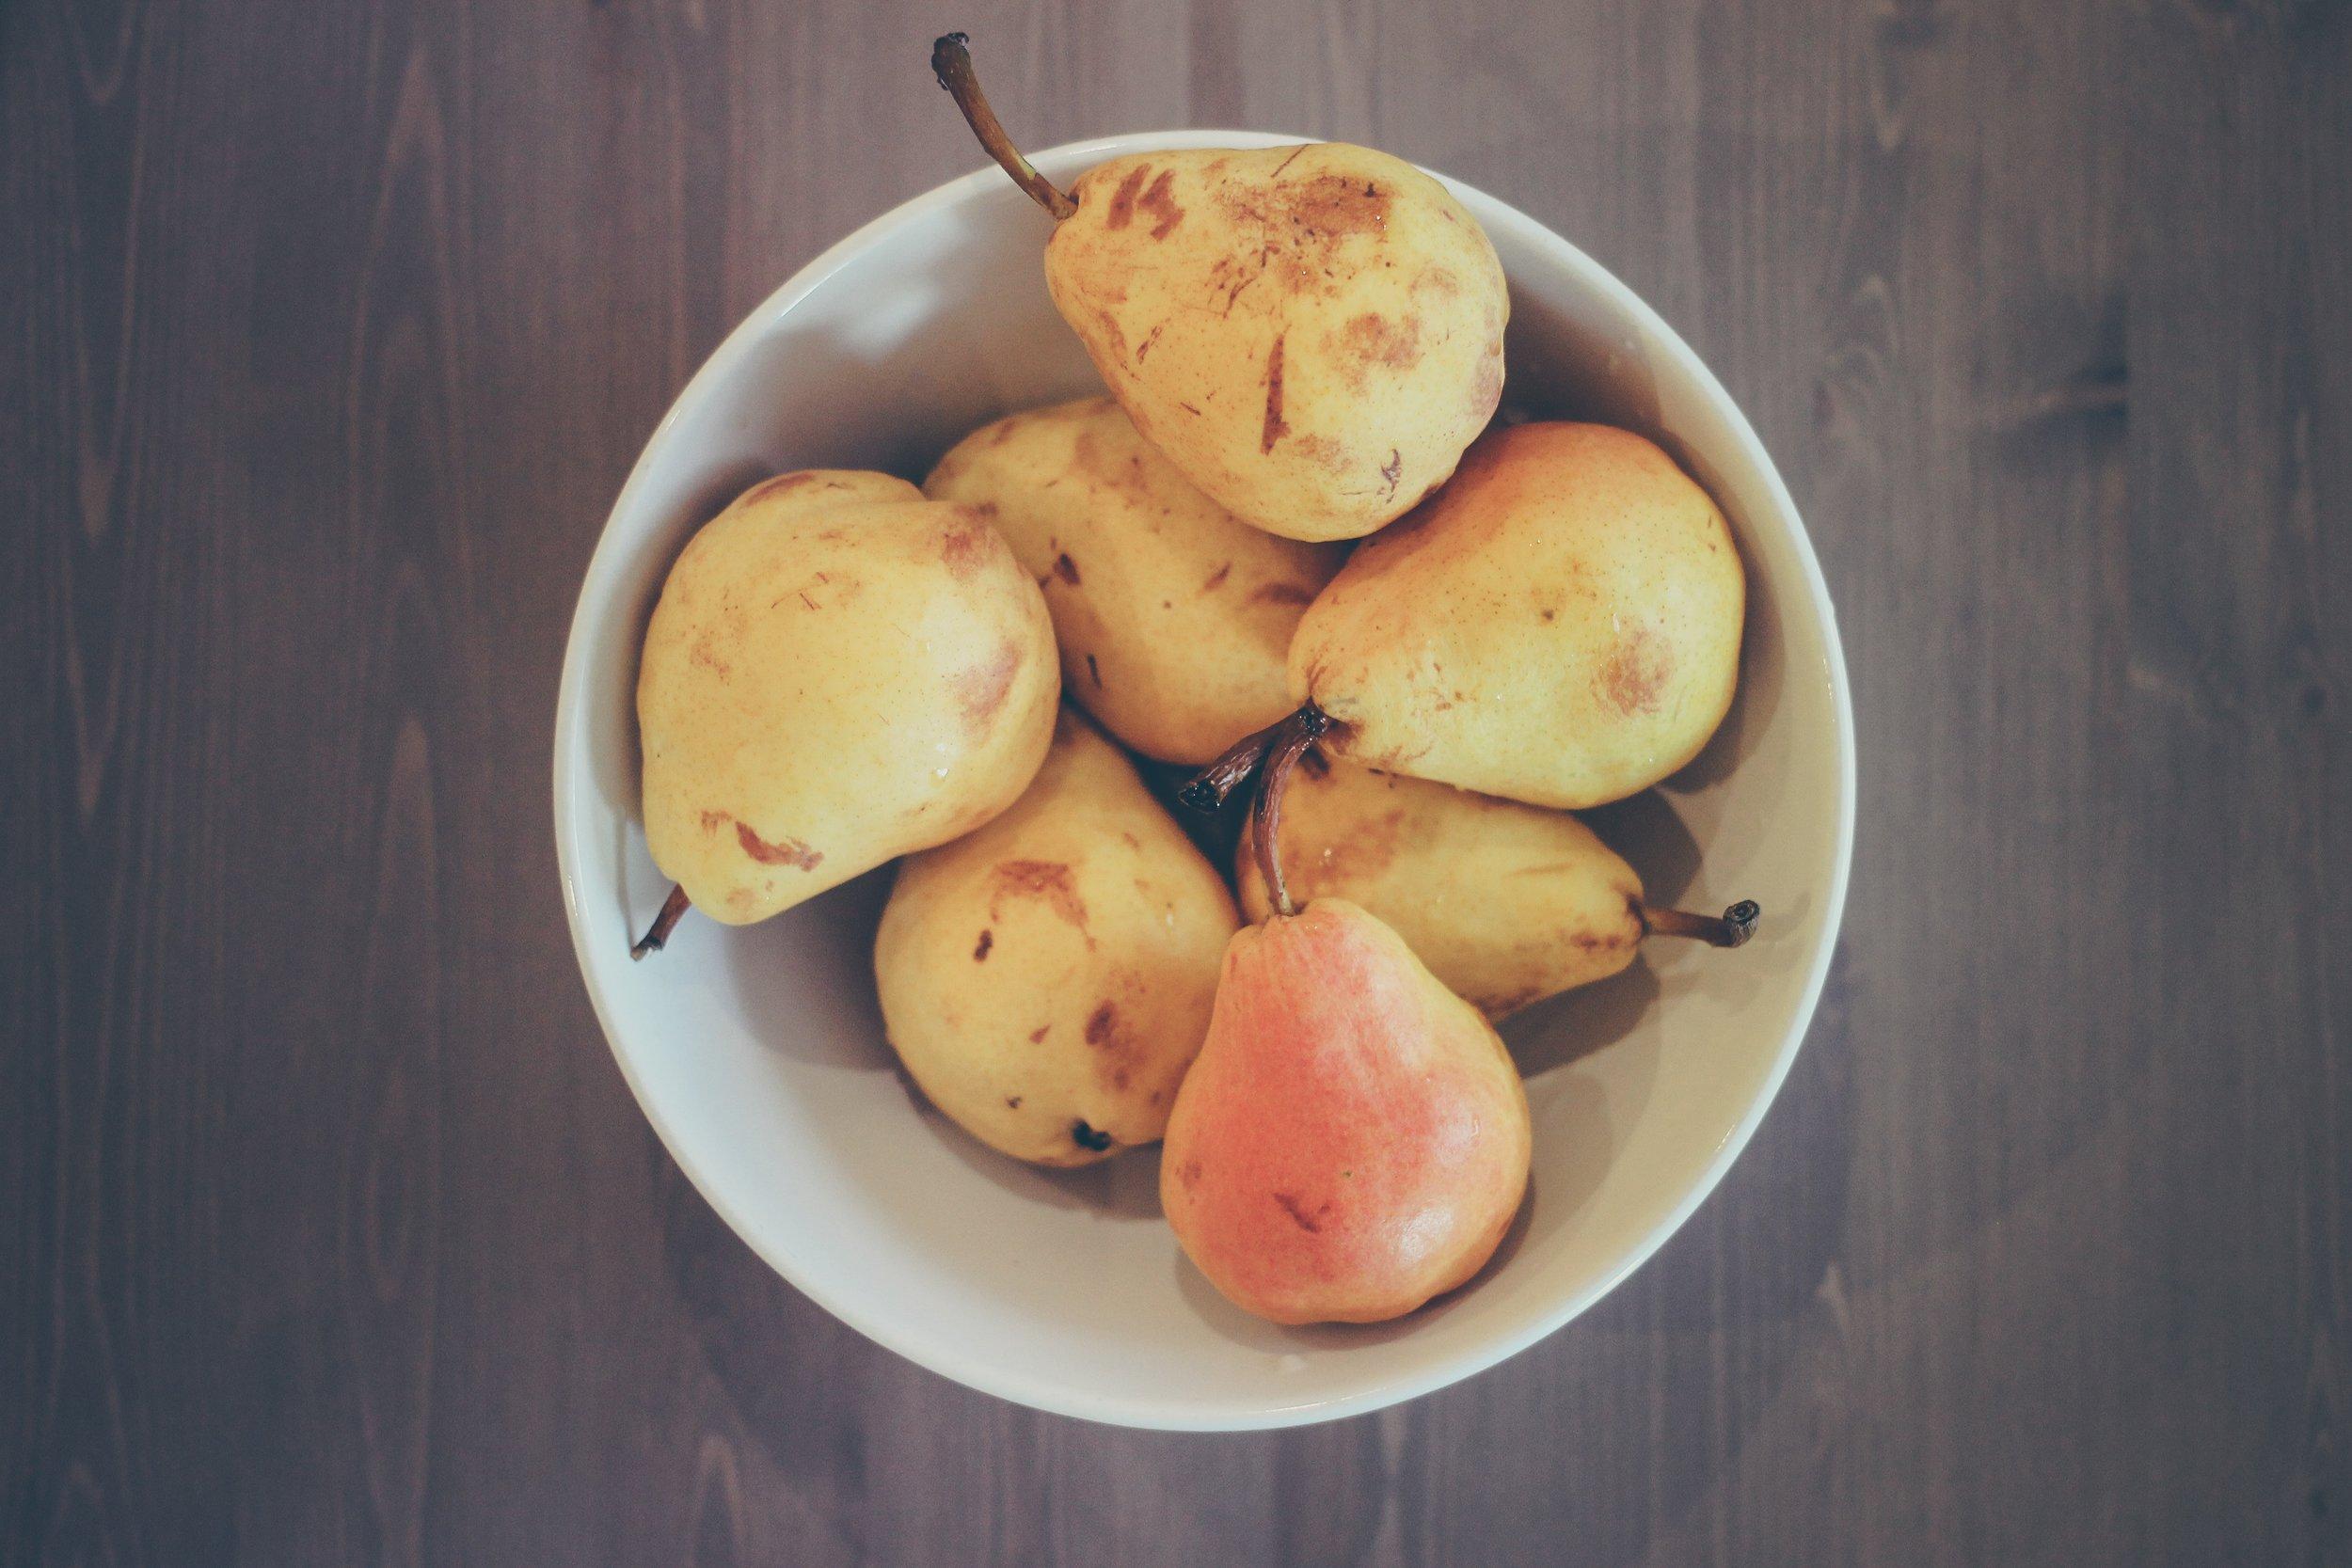 9. Pears -